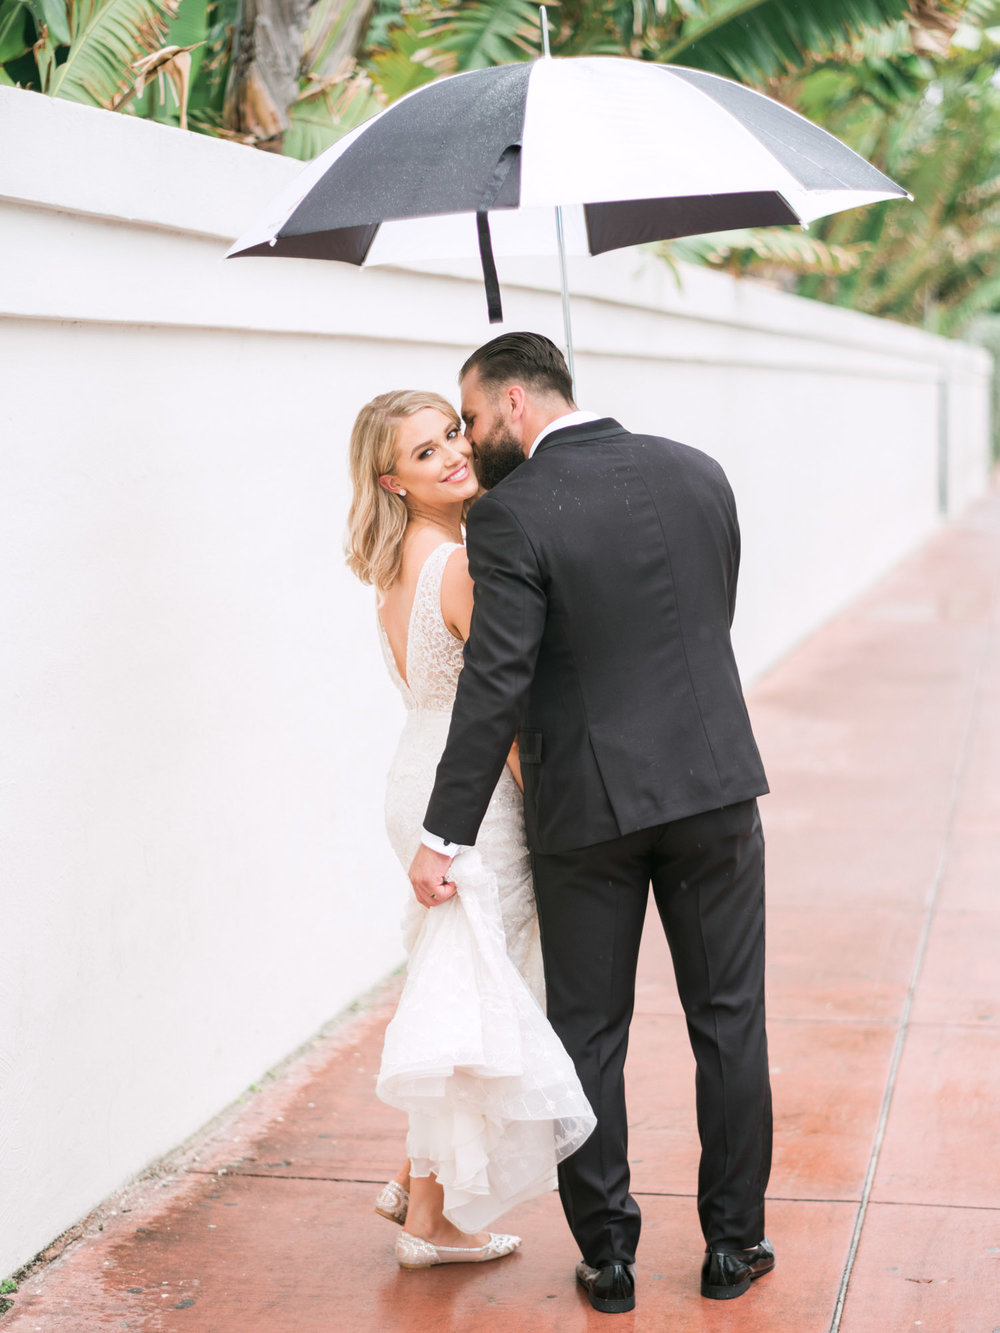 raleigh-miami-beach-destination-film-wedding-1228.jpg